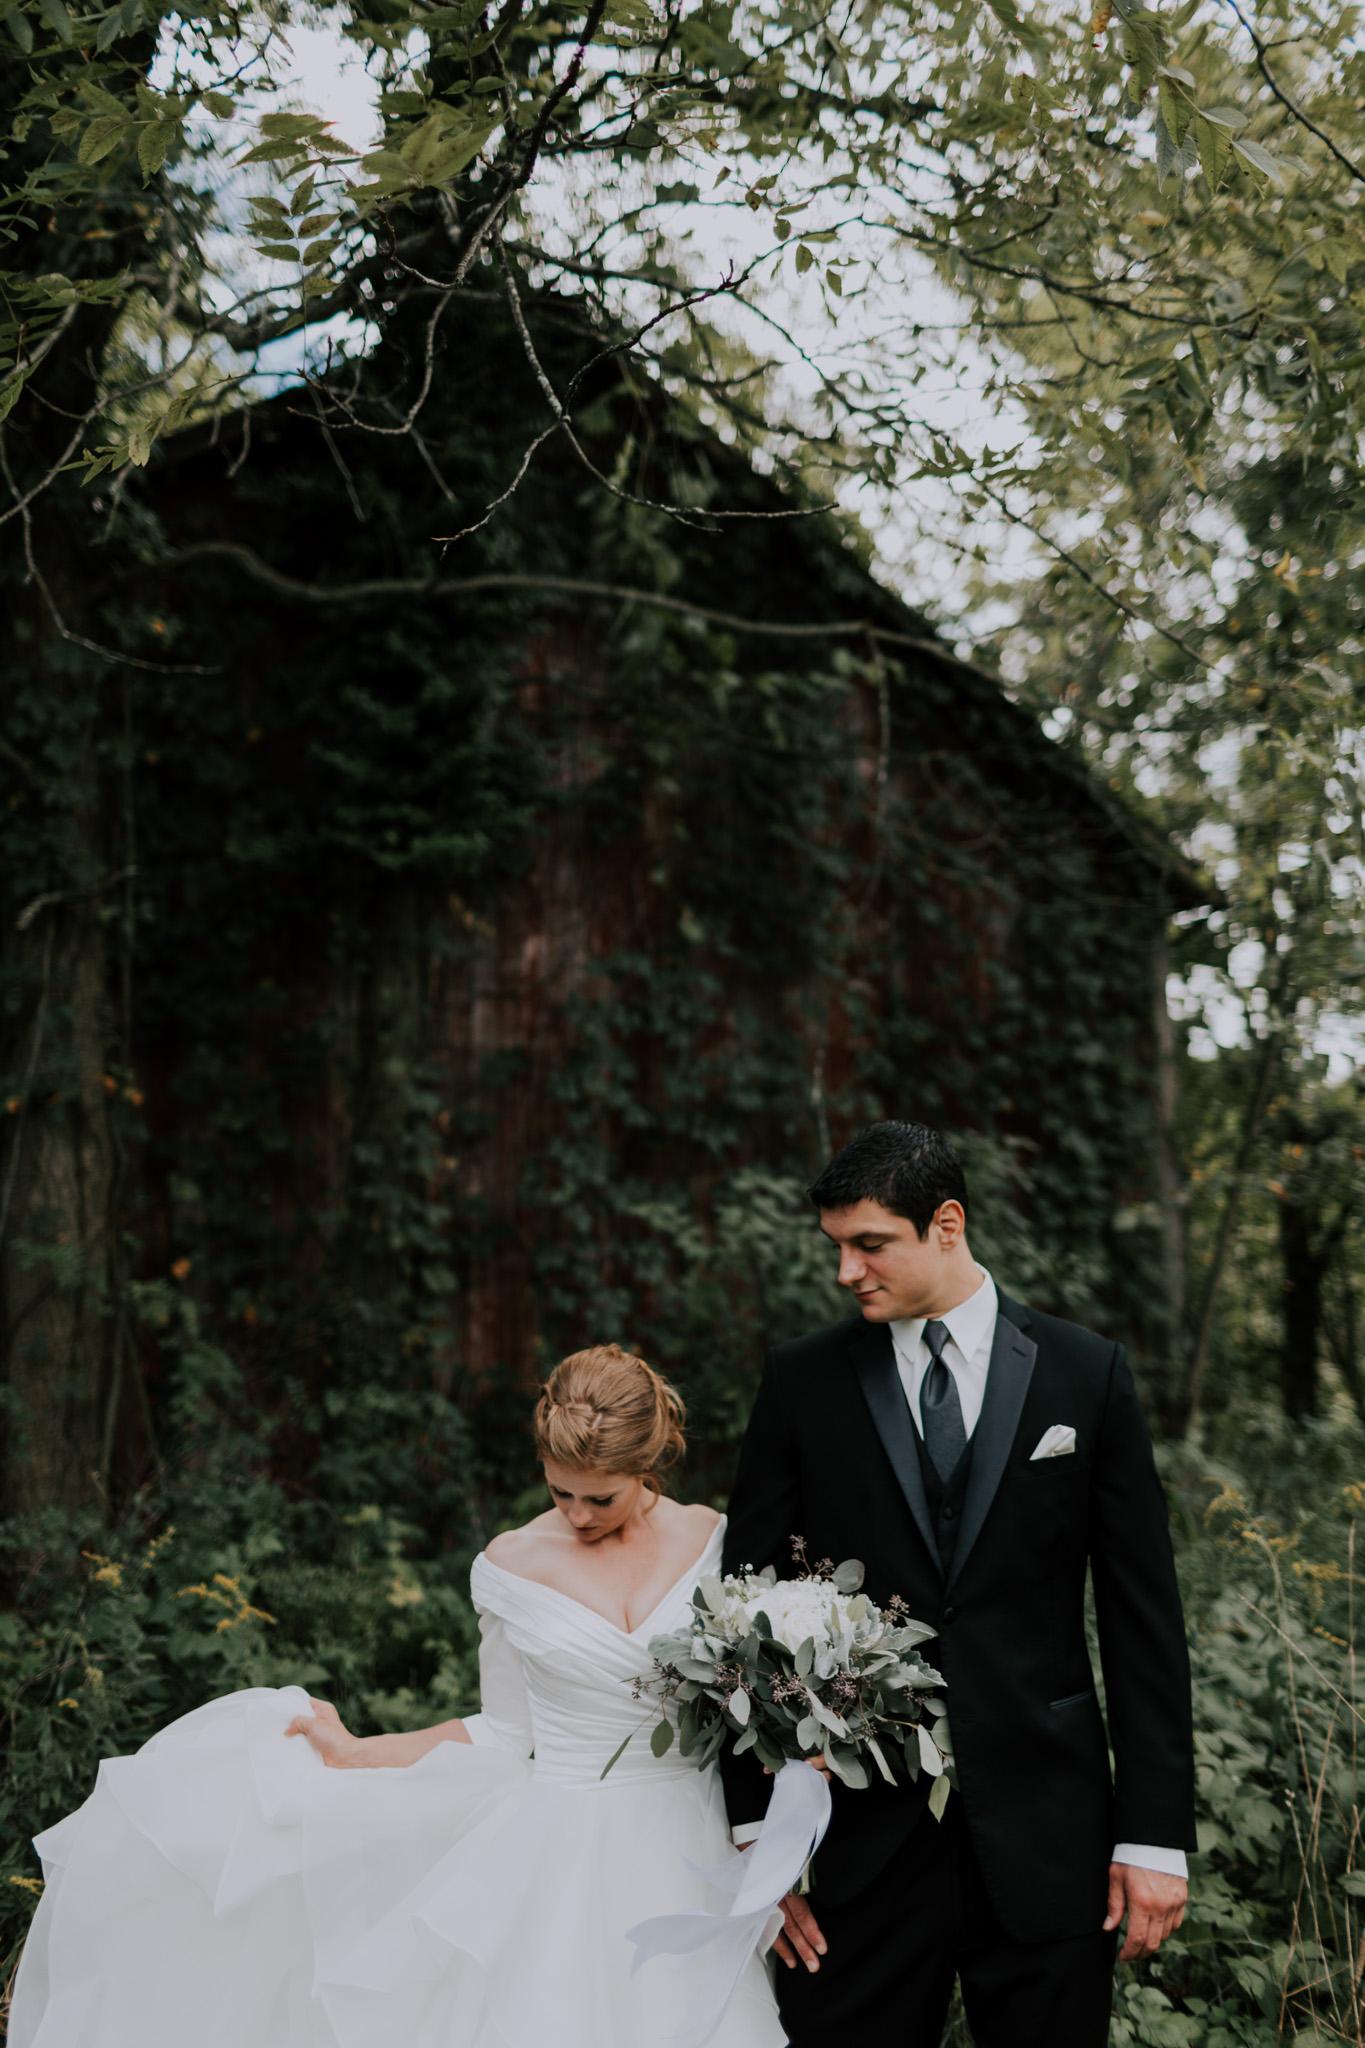 MillCreek-Wilde-Wedding-Barn-Michigan-Eliza-Eric-Vafa-Photo437.jpg